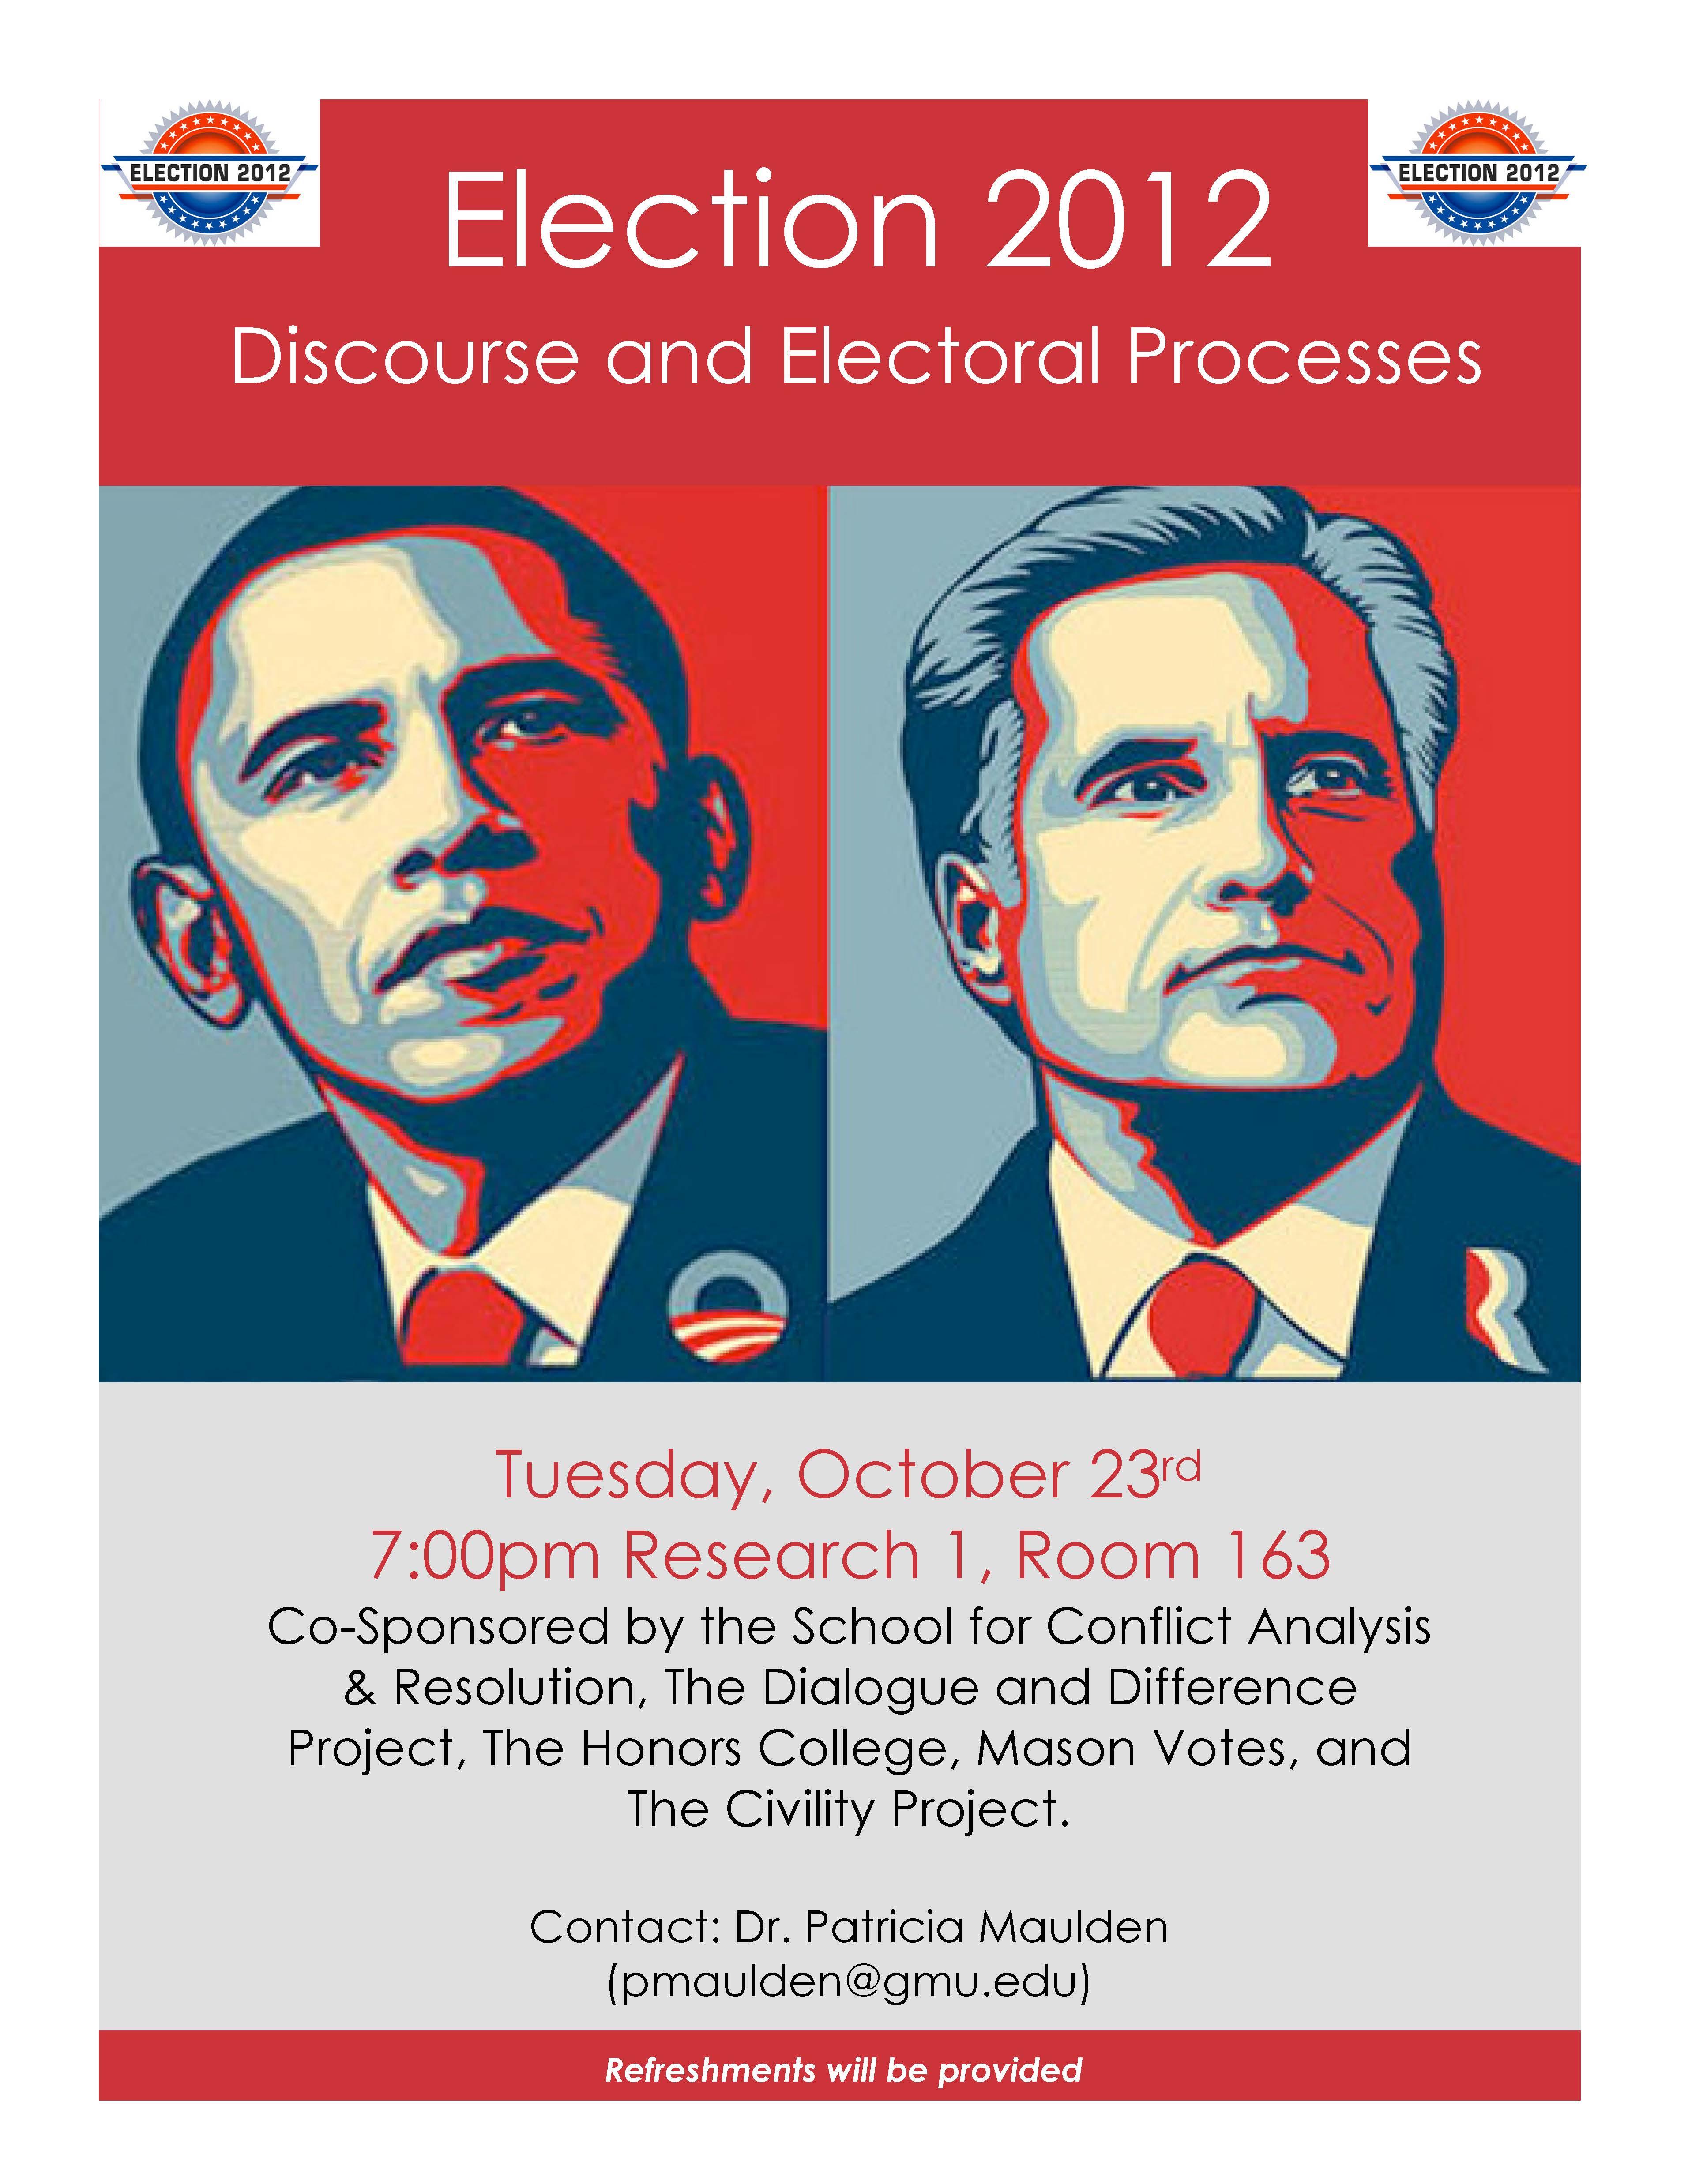 Election 2012: Discourse & Electoral Processes | Mason Votes